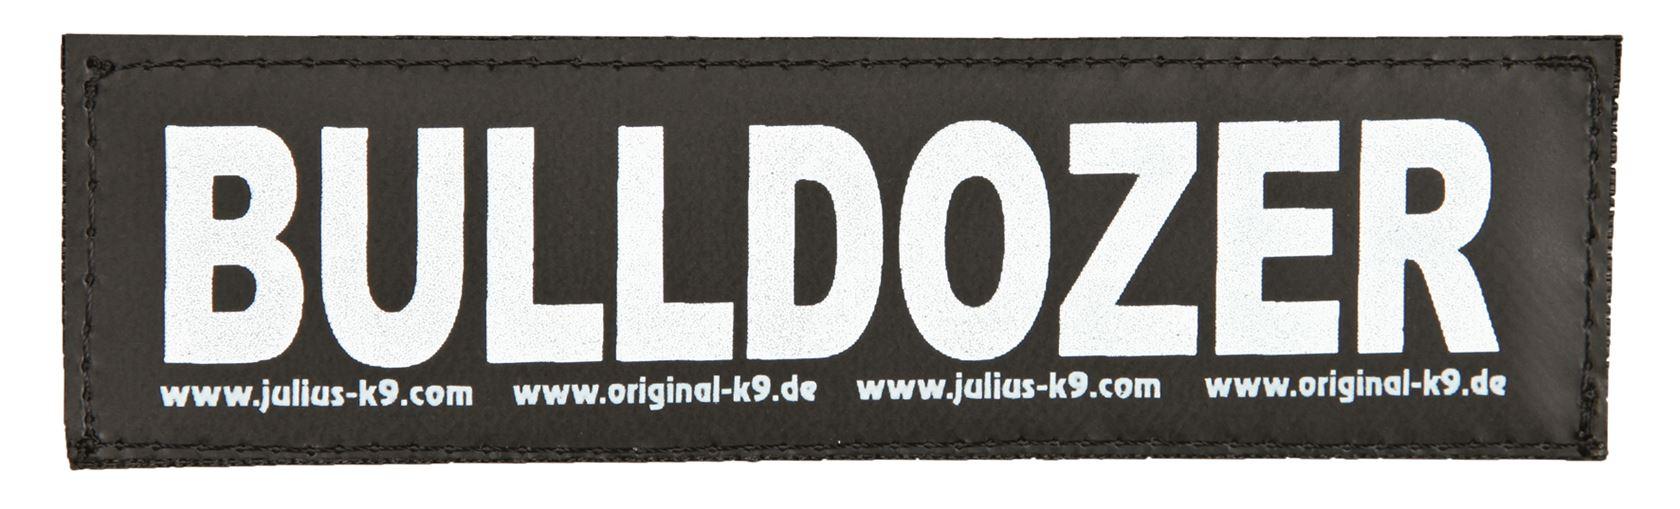 julius-k9 velcro sticker small bulldozer (2sts)